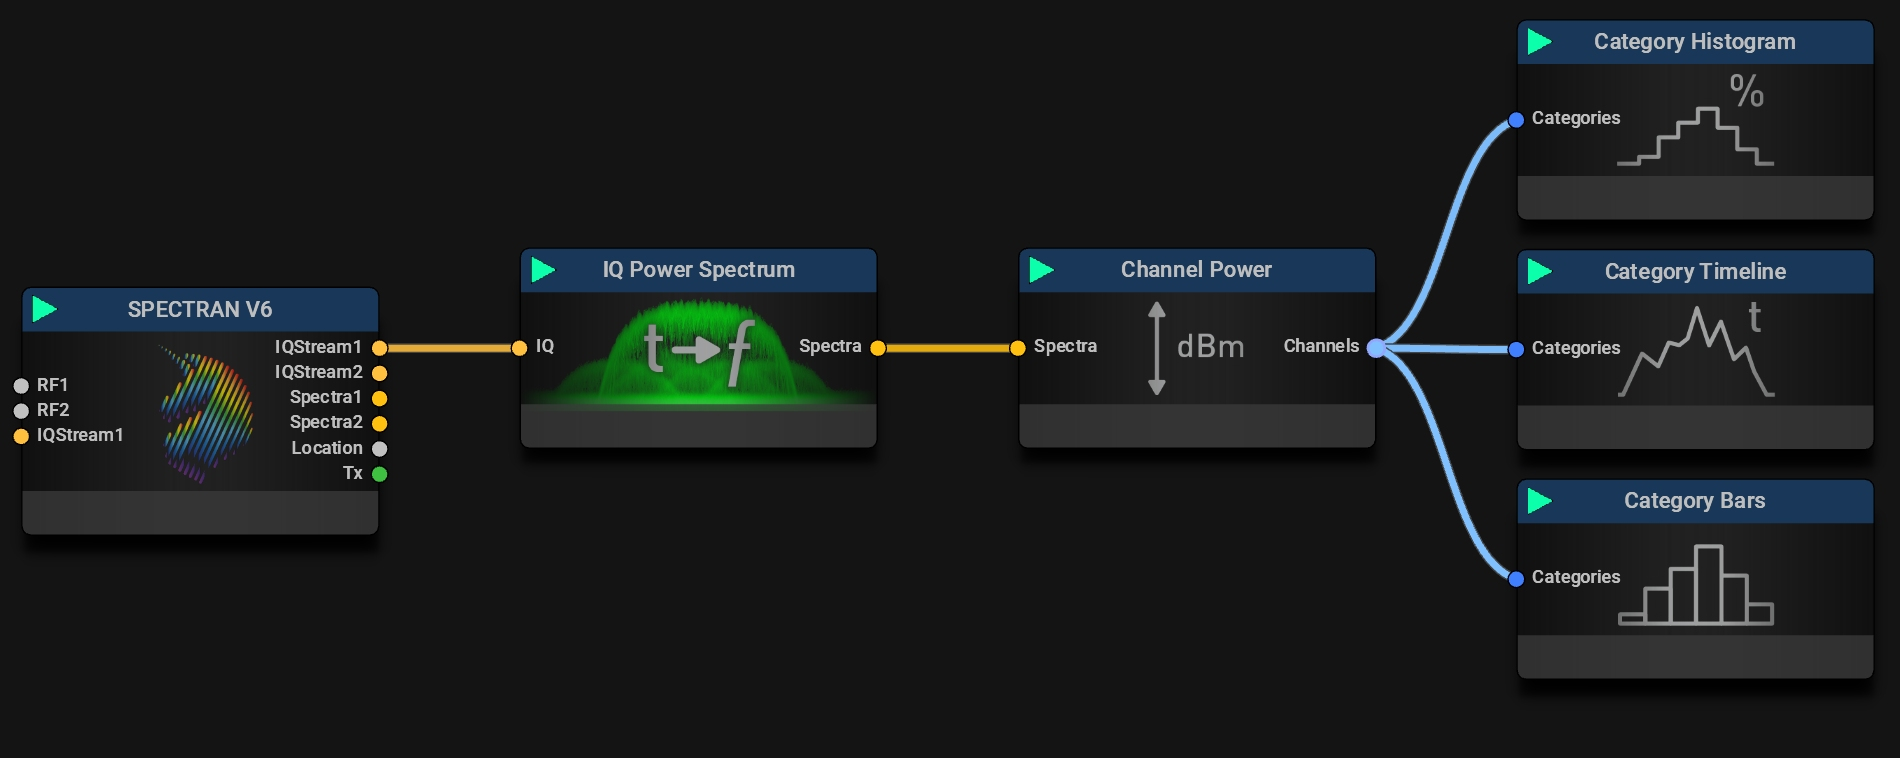 Channel Power Mission Setup